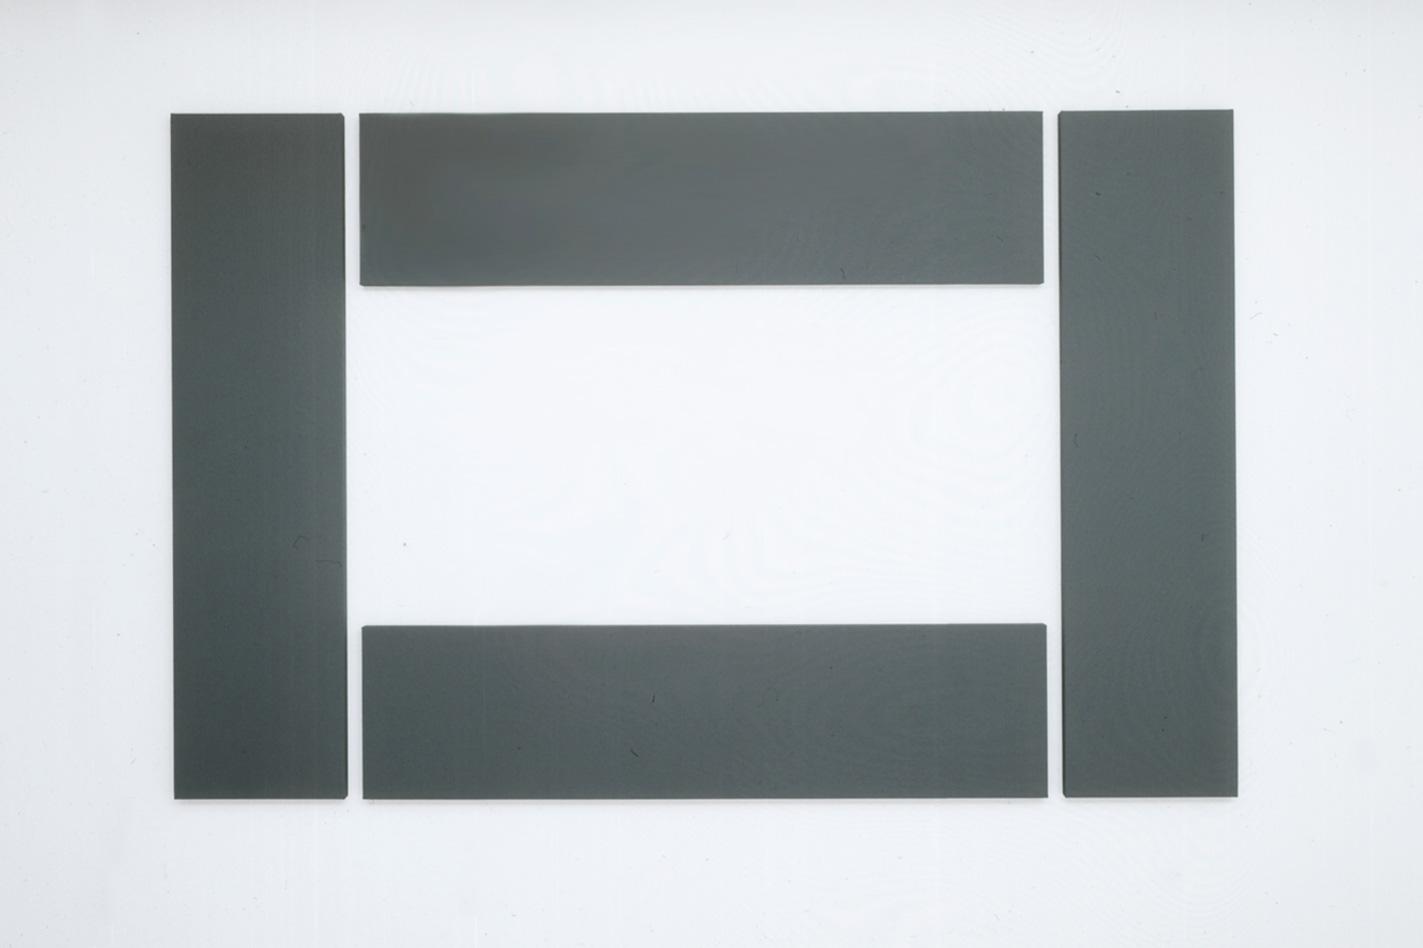 Artists Gallery Hans Mayer Open Electrical Panels Are Dangerous C Daniel Friedman Border Painting 1992 180 X 279 Cm 4 Parts Acrylic On Cotton Duck Canvas